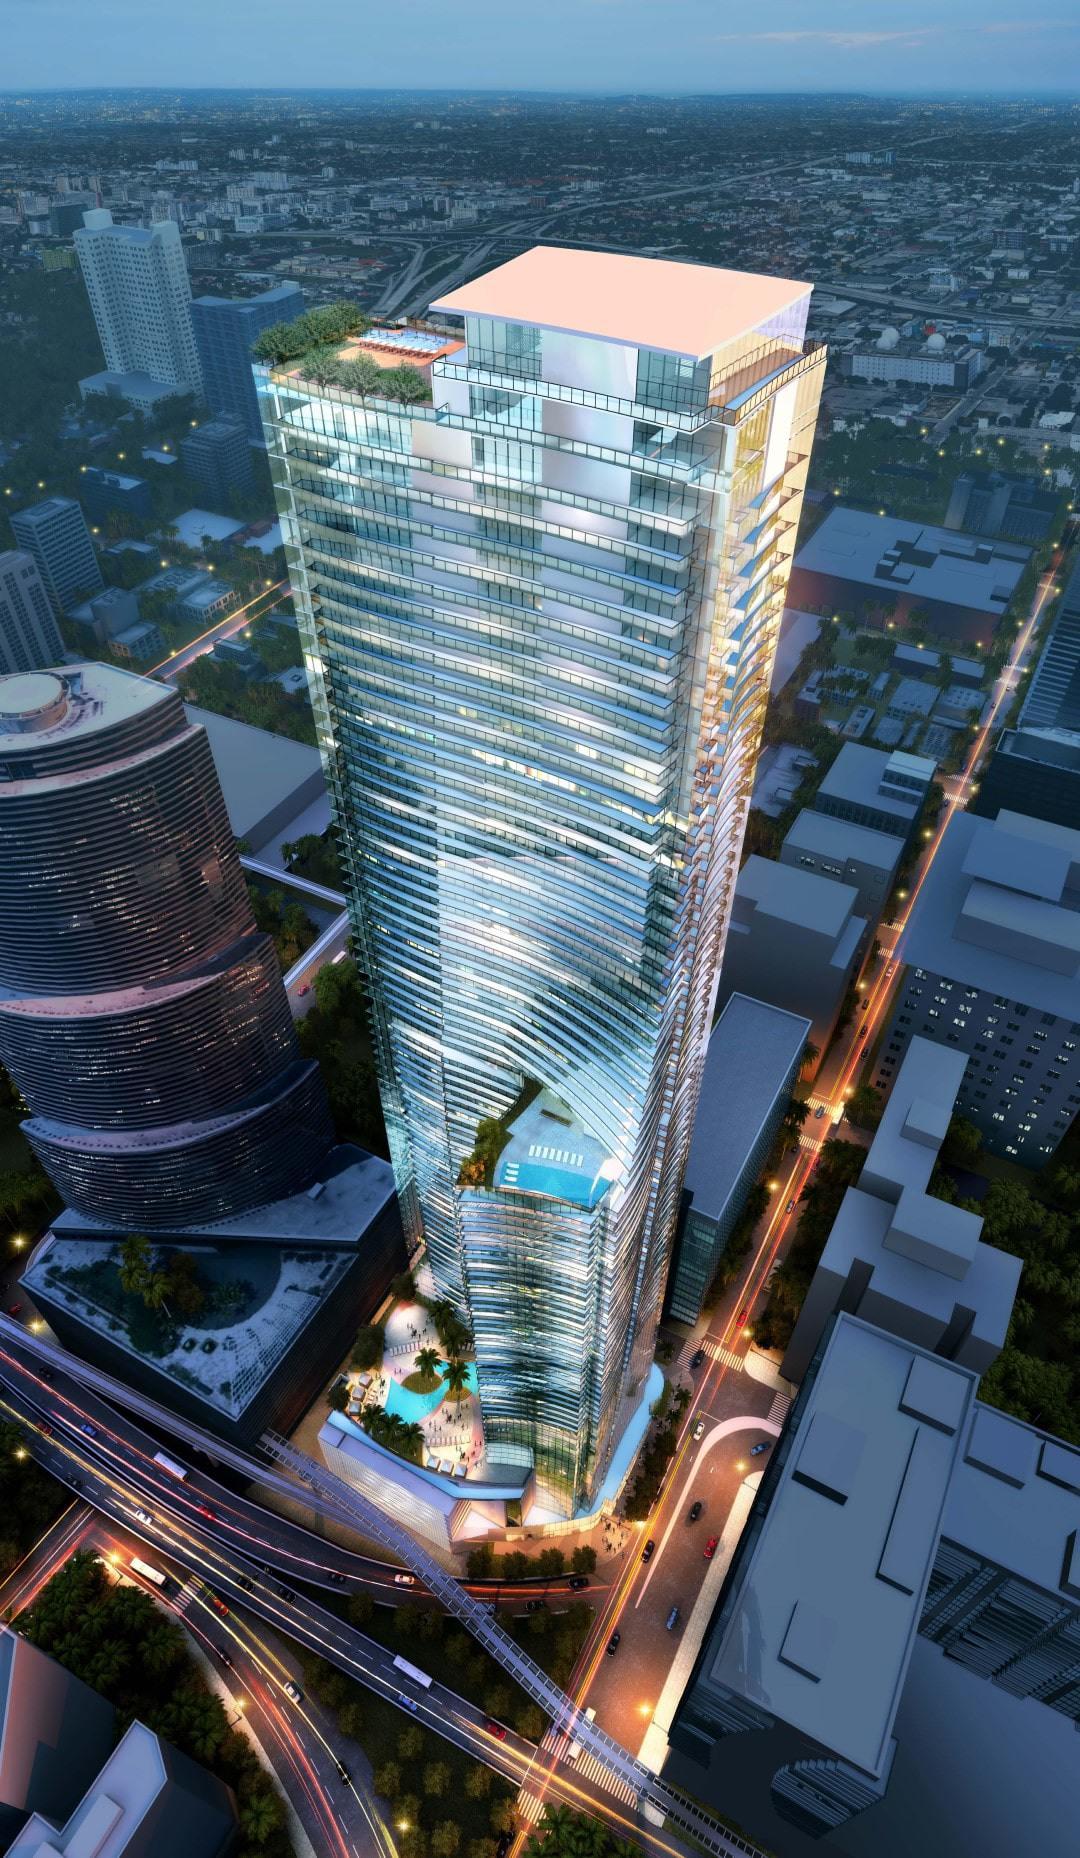 Rendering of 82 Story Tower